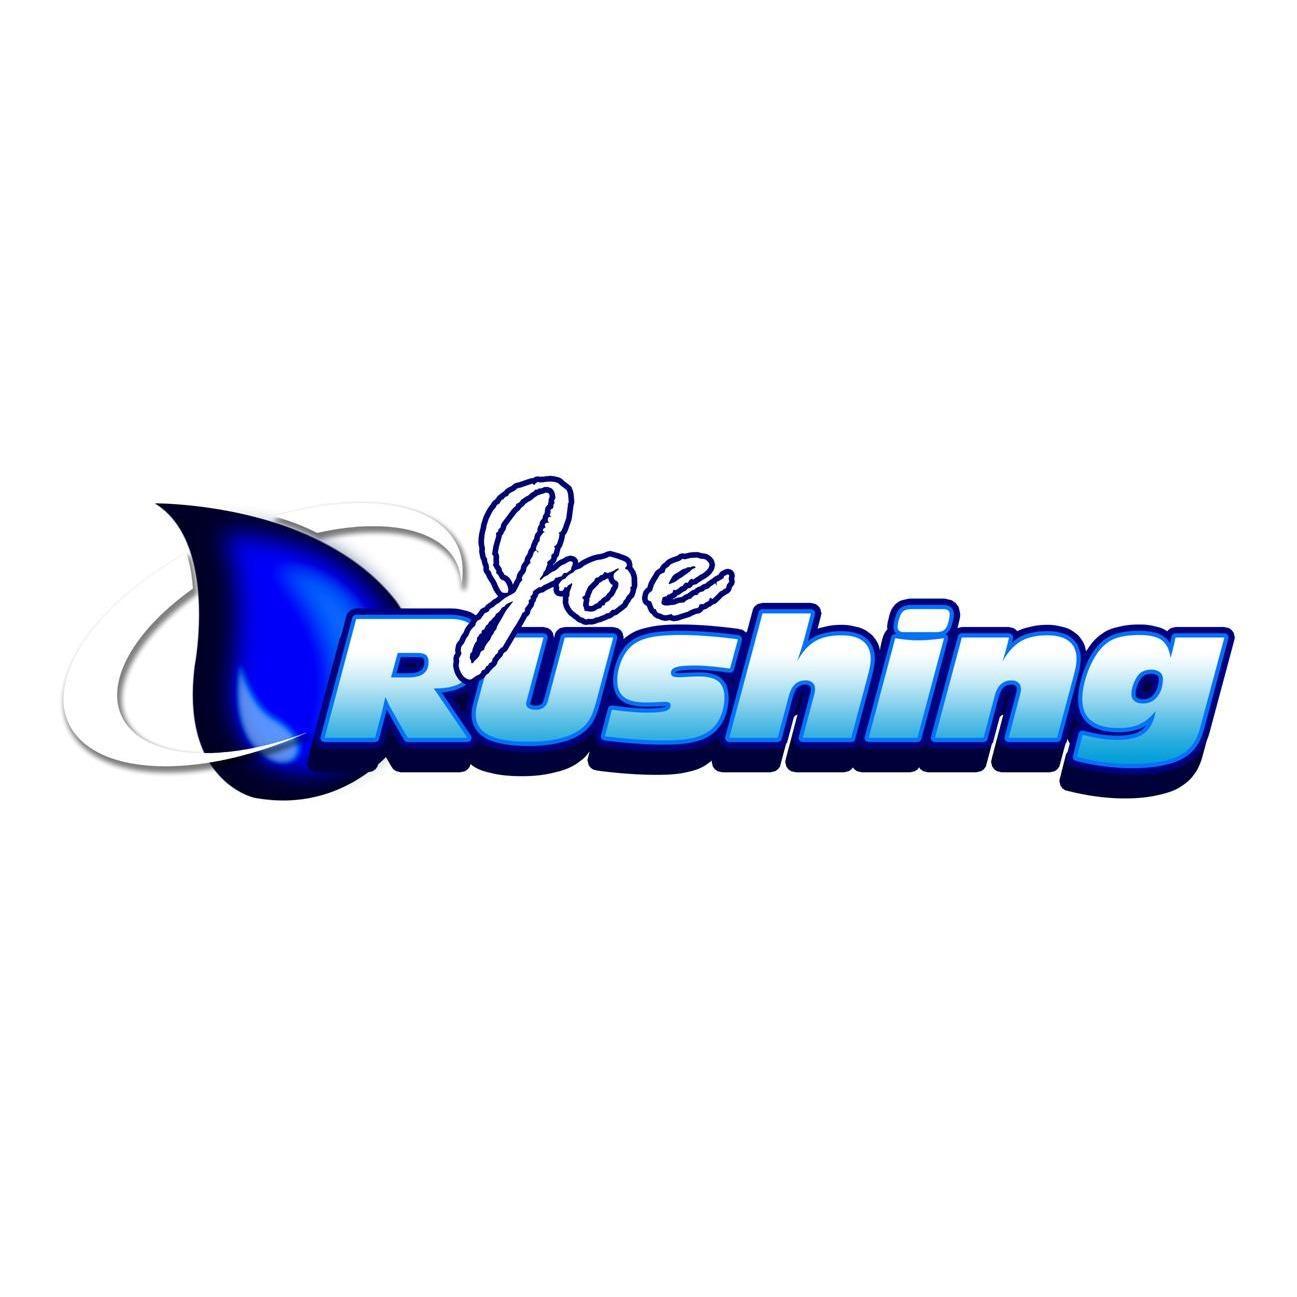 Joe Rushing Plumbing image 2